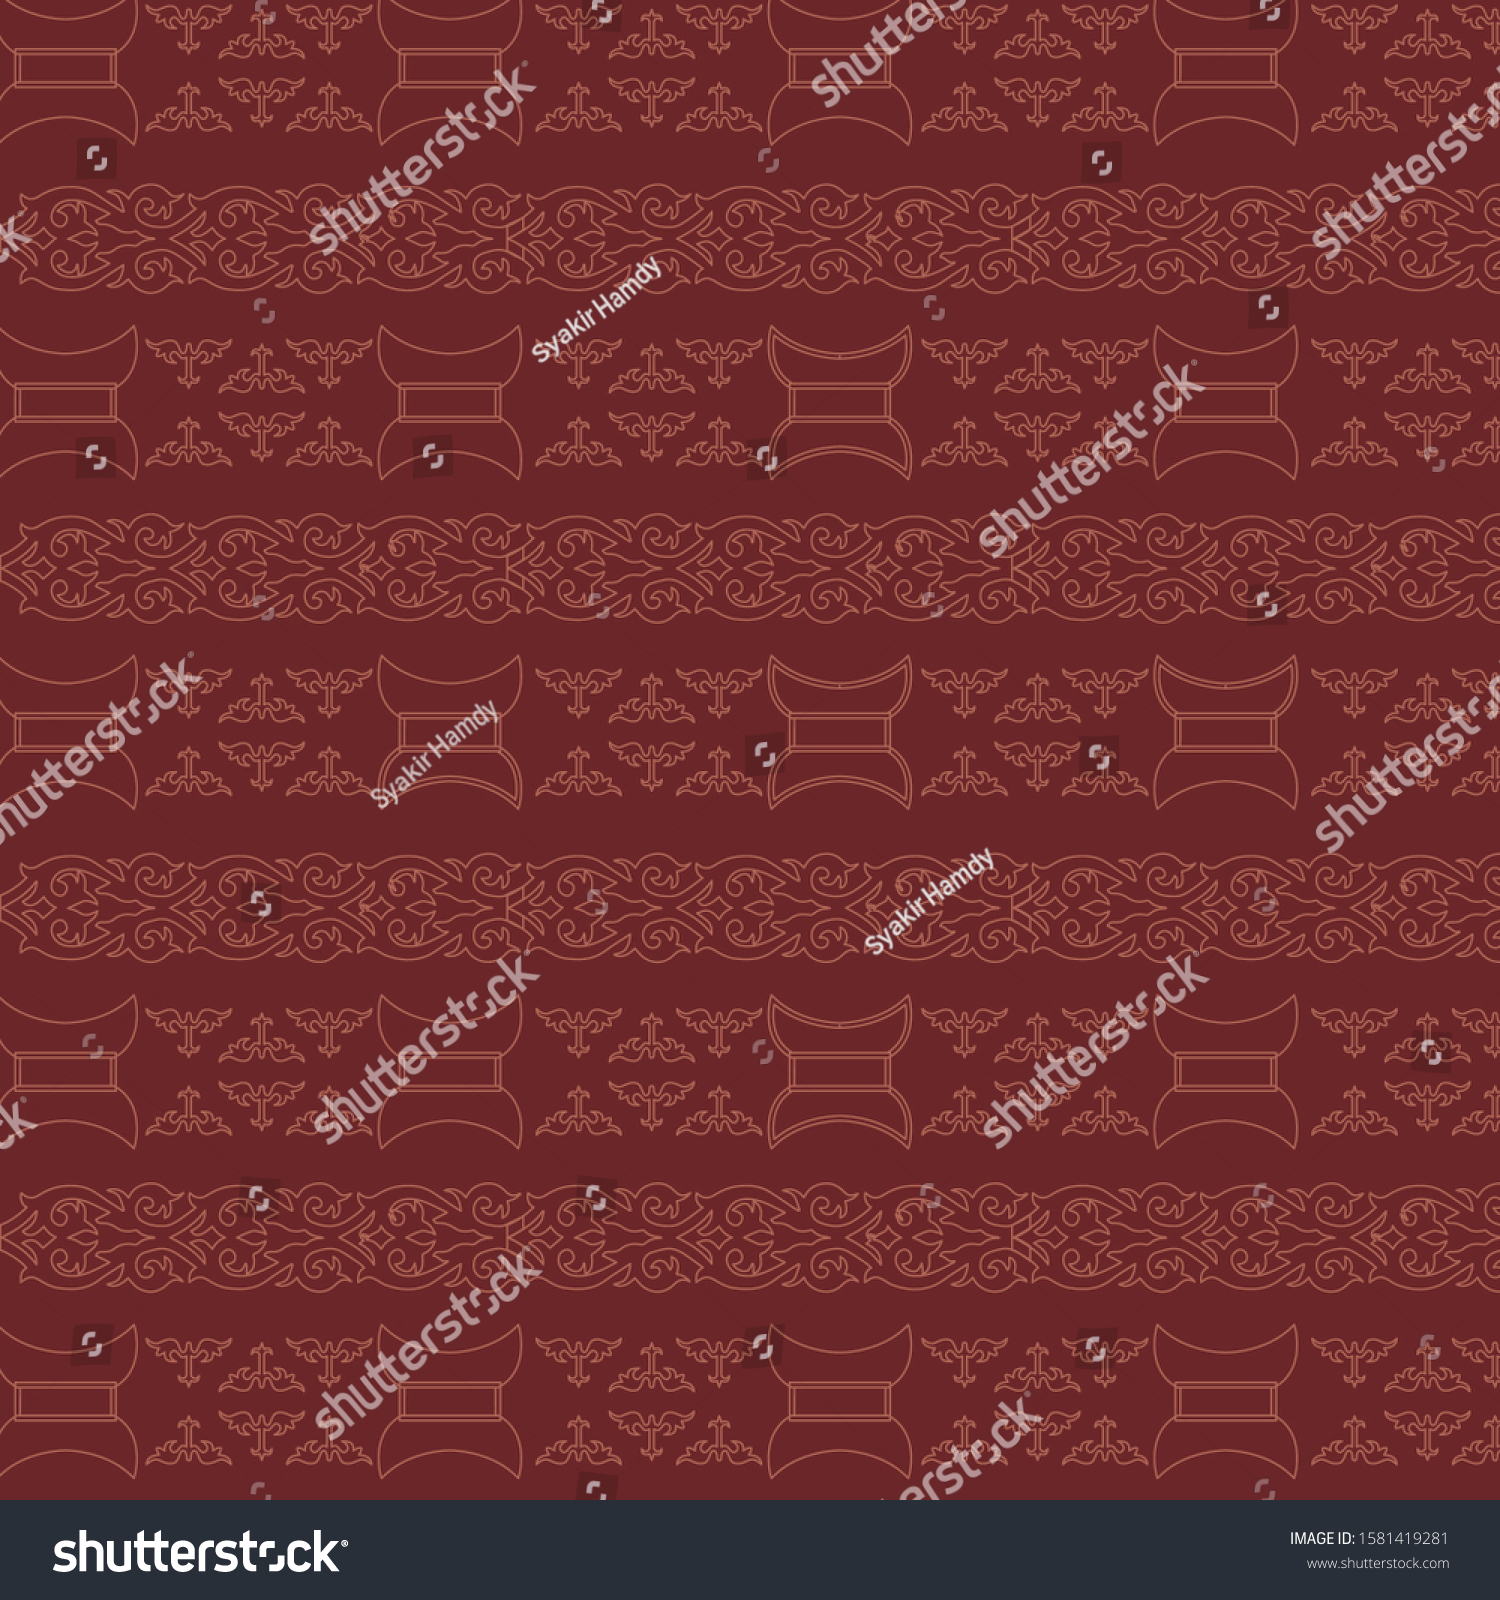 batik pintu aceh pattern traditional indonesia stock vector royalty free 1581419281 https www shutterstock com image vector batik pintu aceh pattern traditional indonesia 1581419281